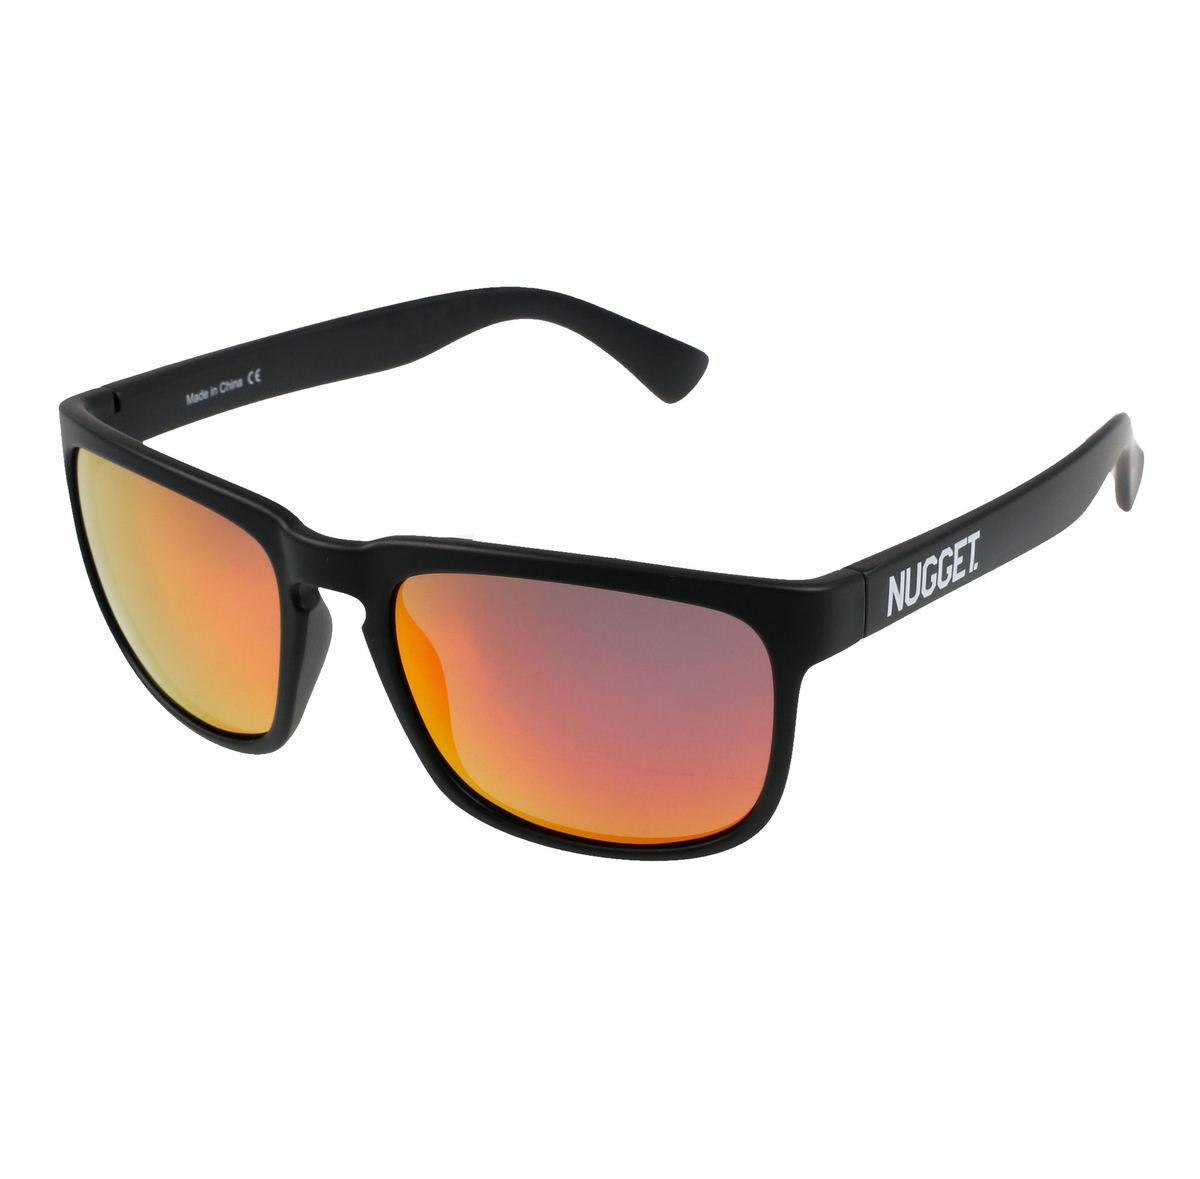 okuliare slnečné NUGGET - CLONE E 4/17/38 - BLACK RED - MEAT128